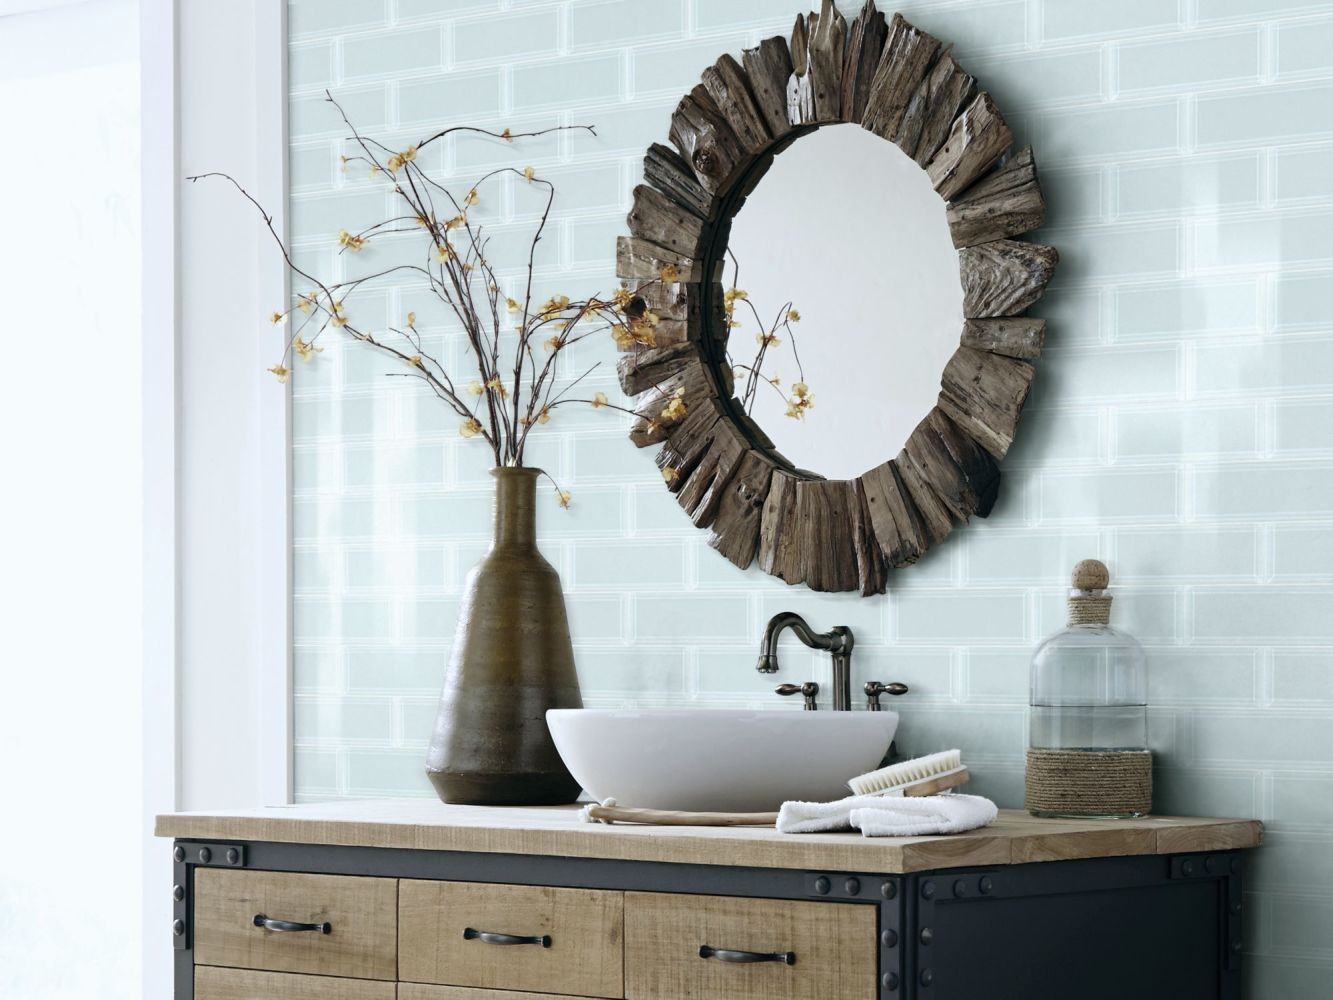 Shaw Floors Home Fn Gold Ceramic Principal 3×9 Beveled Glass Ti Skylight 00150_TG75B